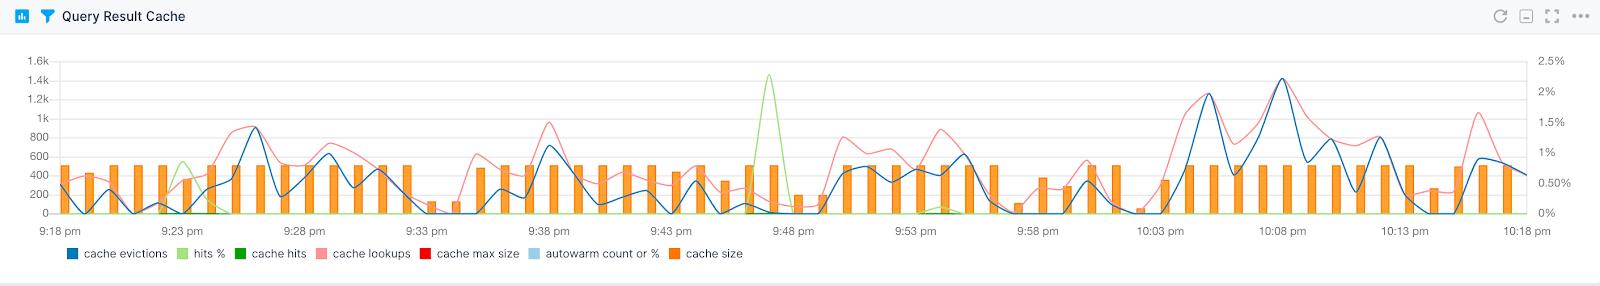 Solr Monitoring Metrics